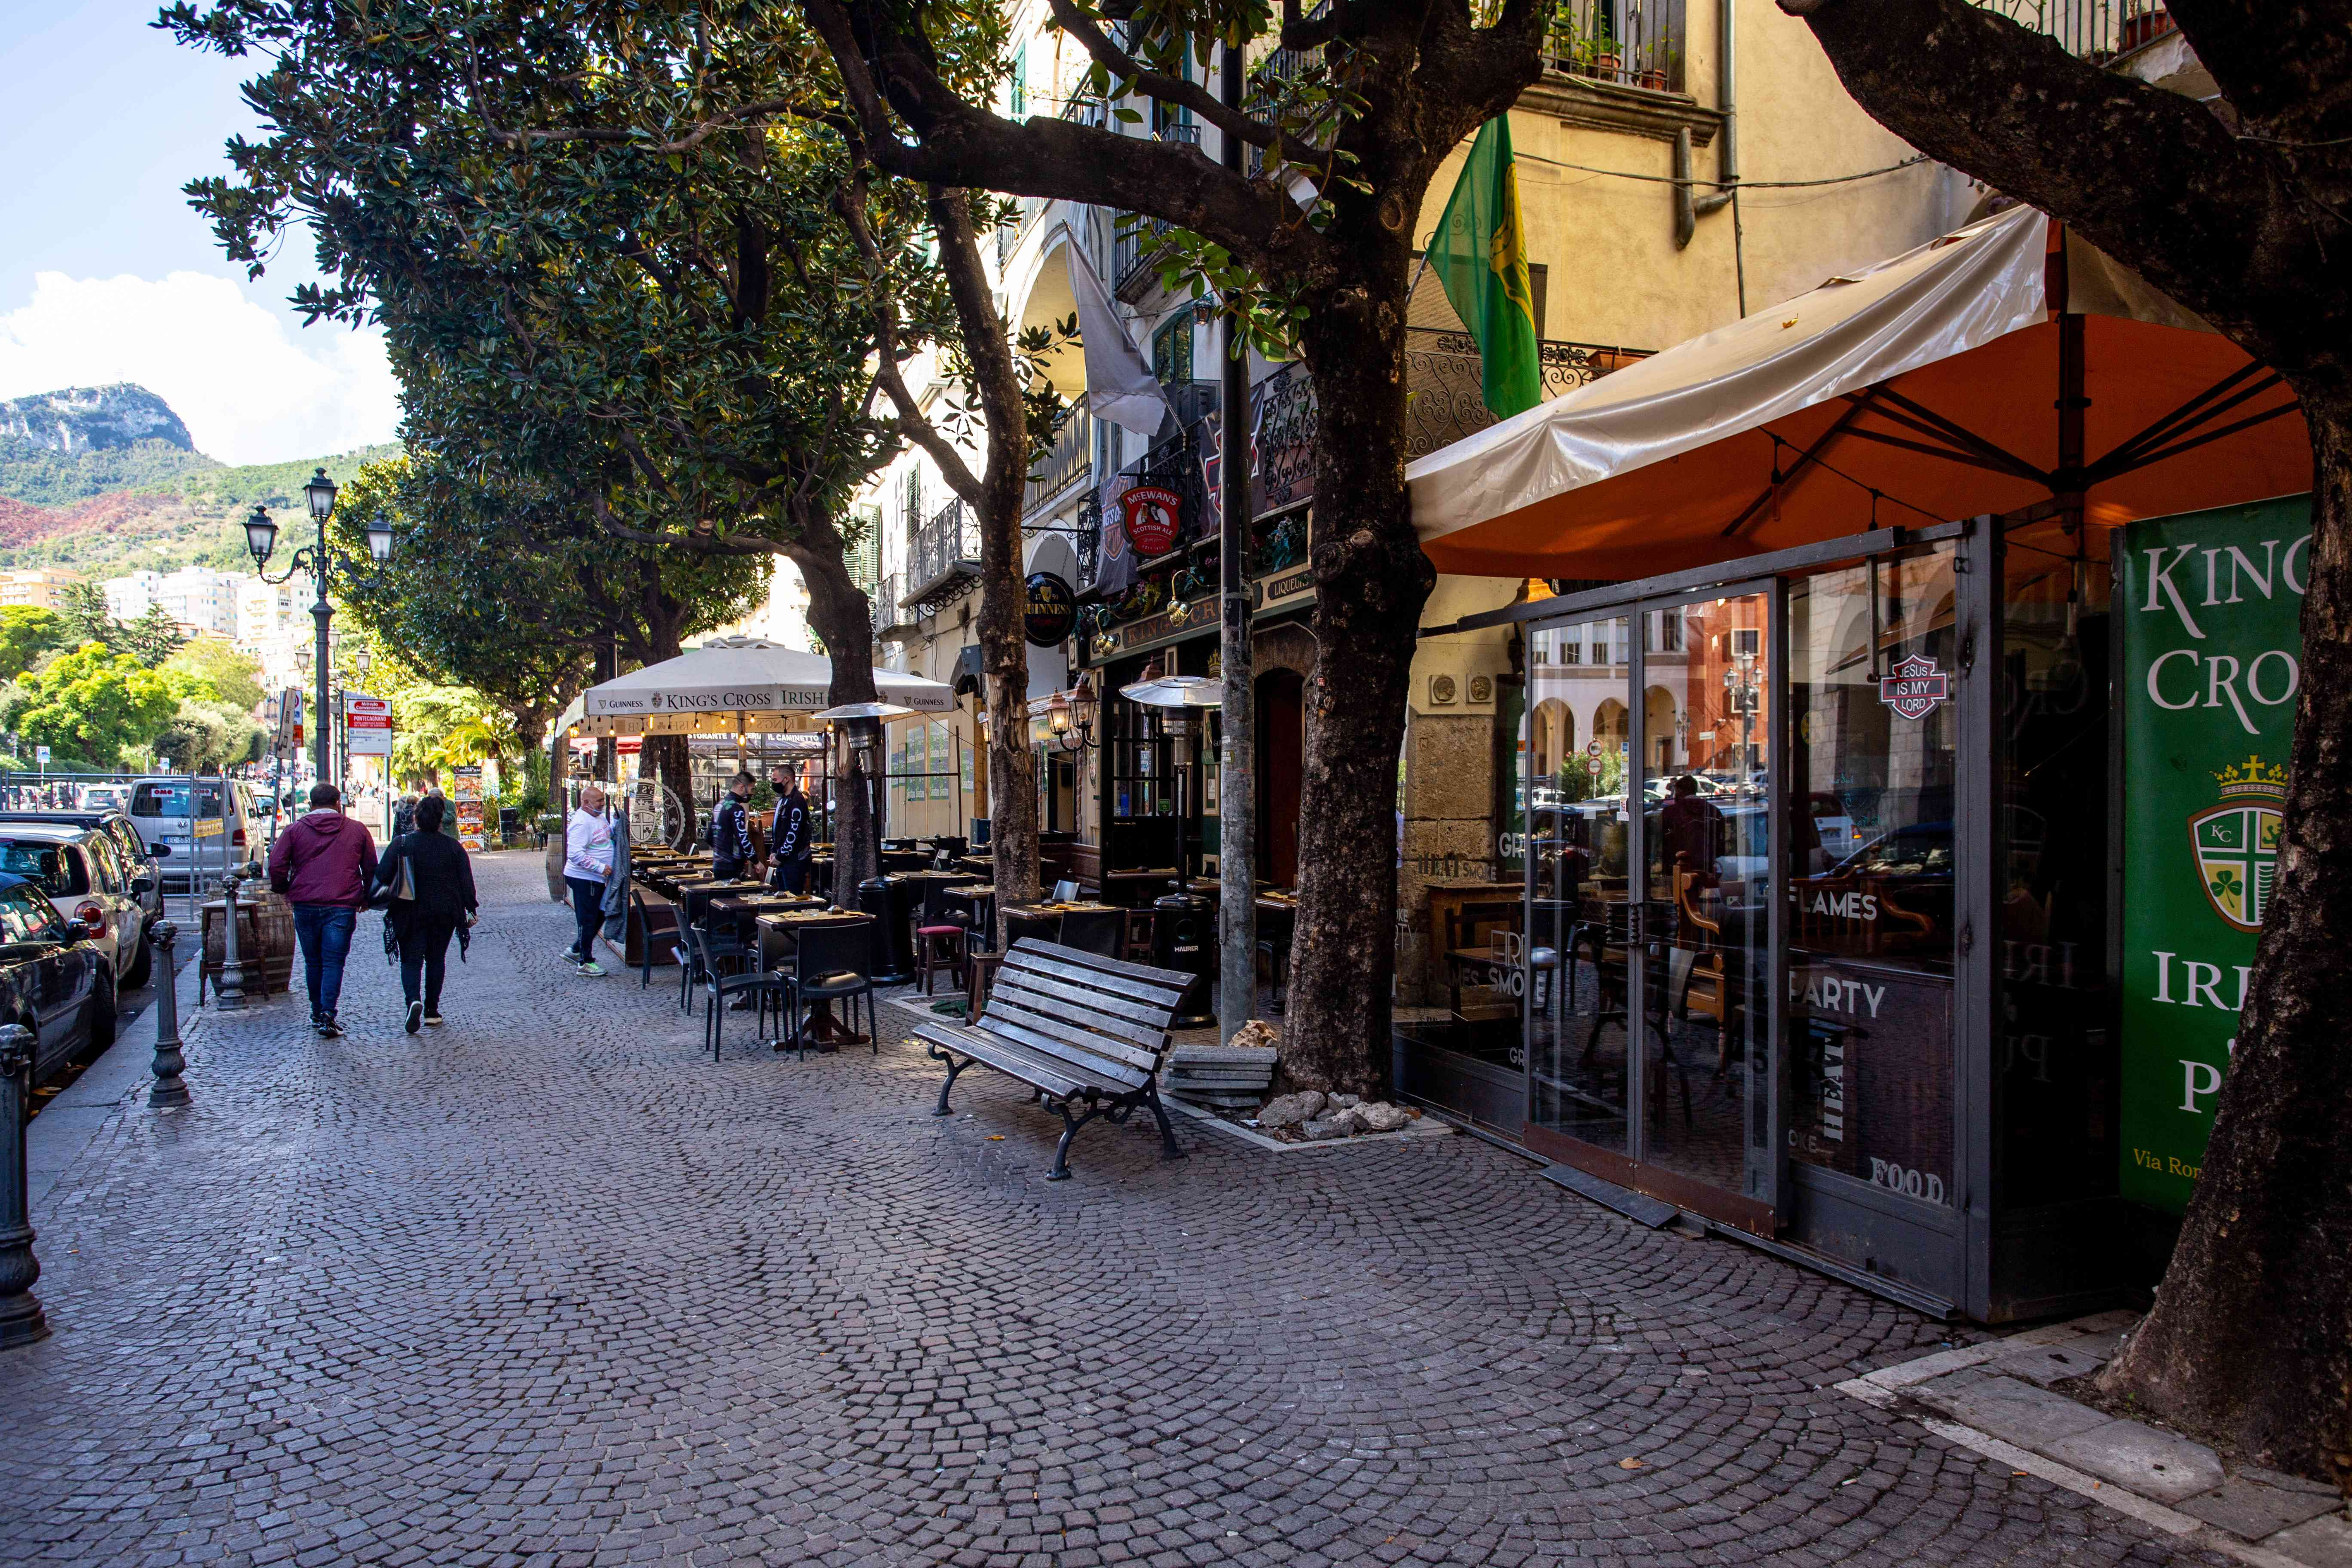 Promenade Trieste in Salerno, Italy